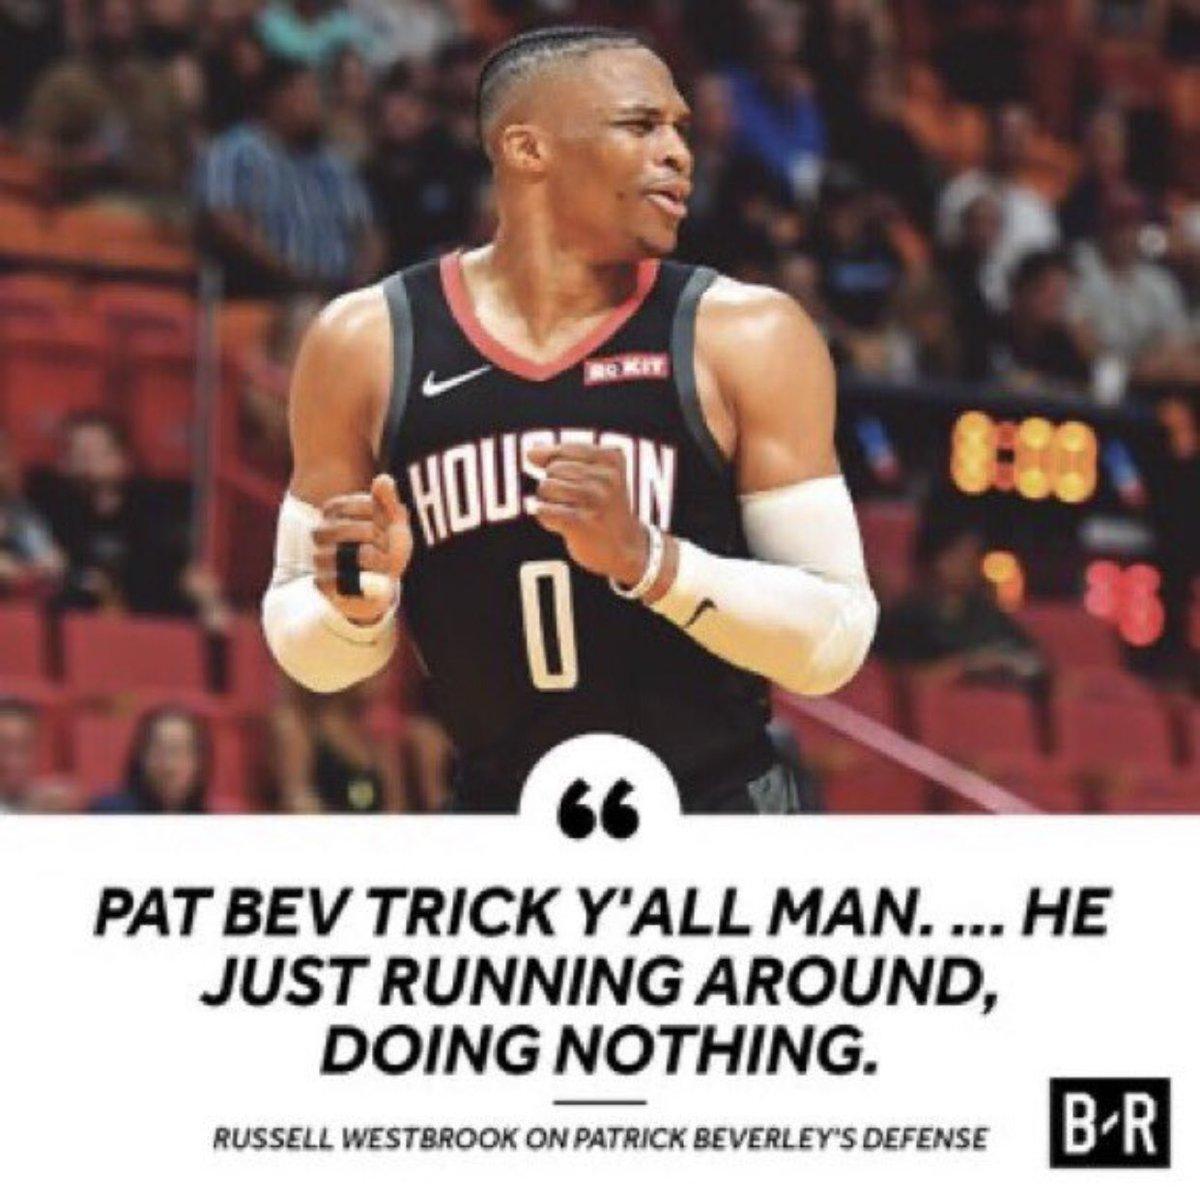 @NBA @spidadmitchell @utahjazz Pat Bev https://t.co/RkkS4ryiwU